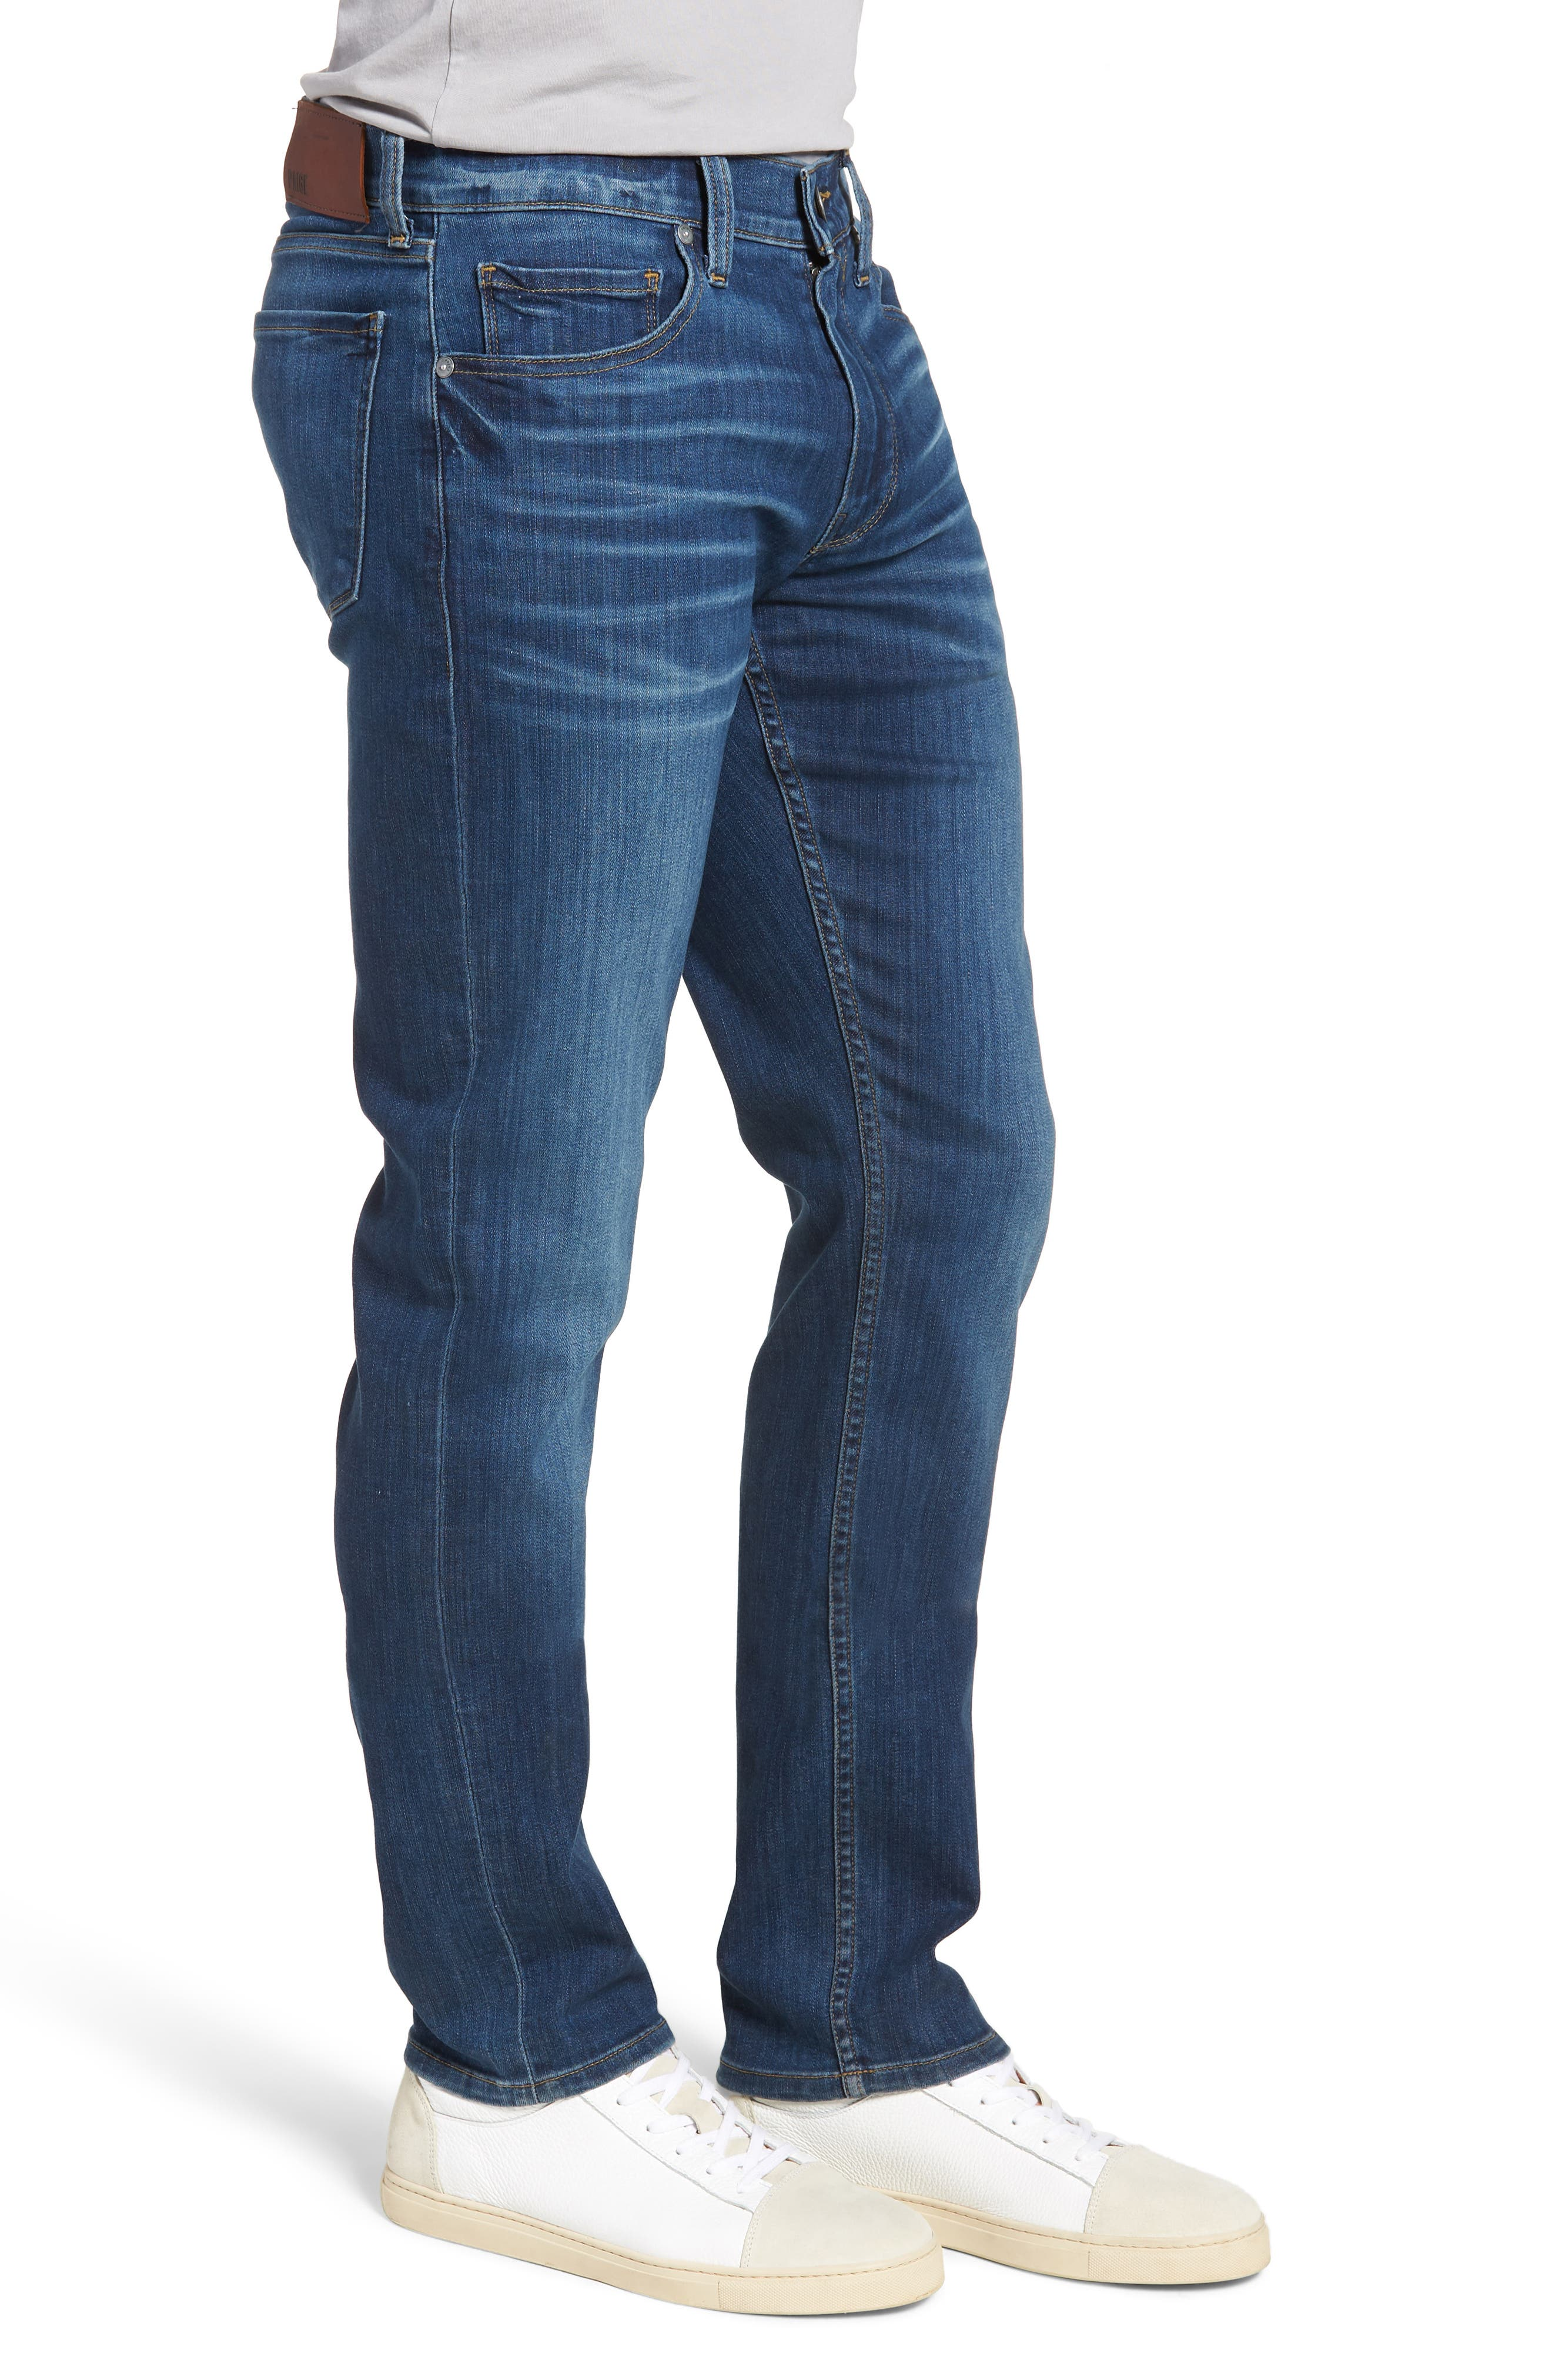 Transcend - Lennox Slim Fit Jeans,                             Alternate thumbnail 3, color,                             Ashbrook